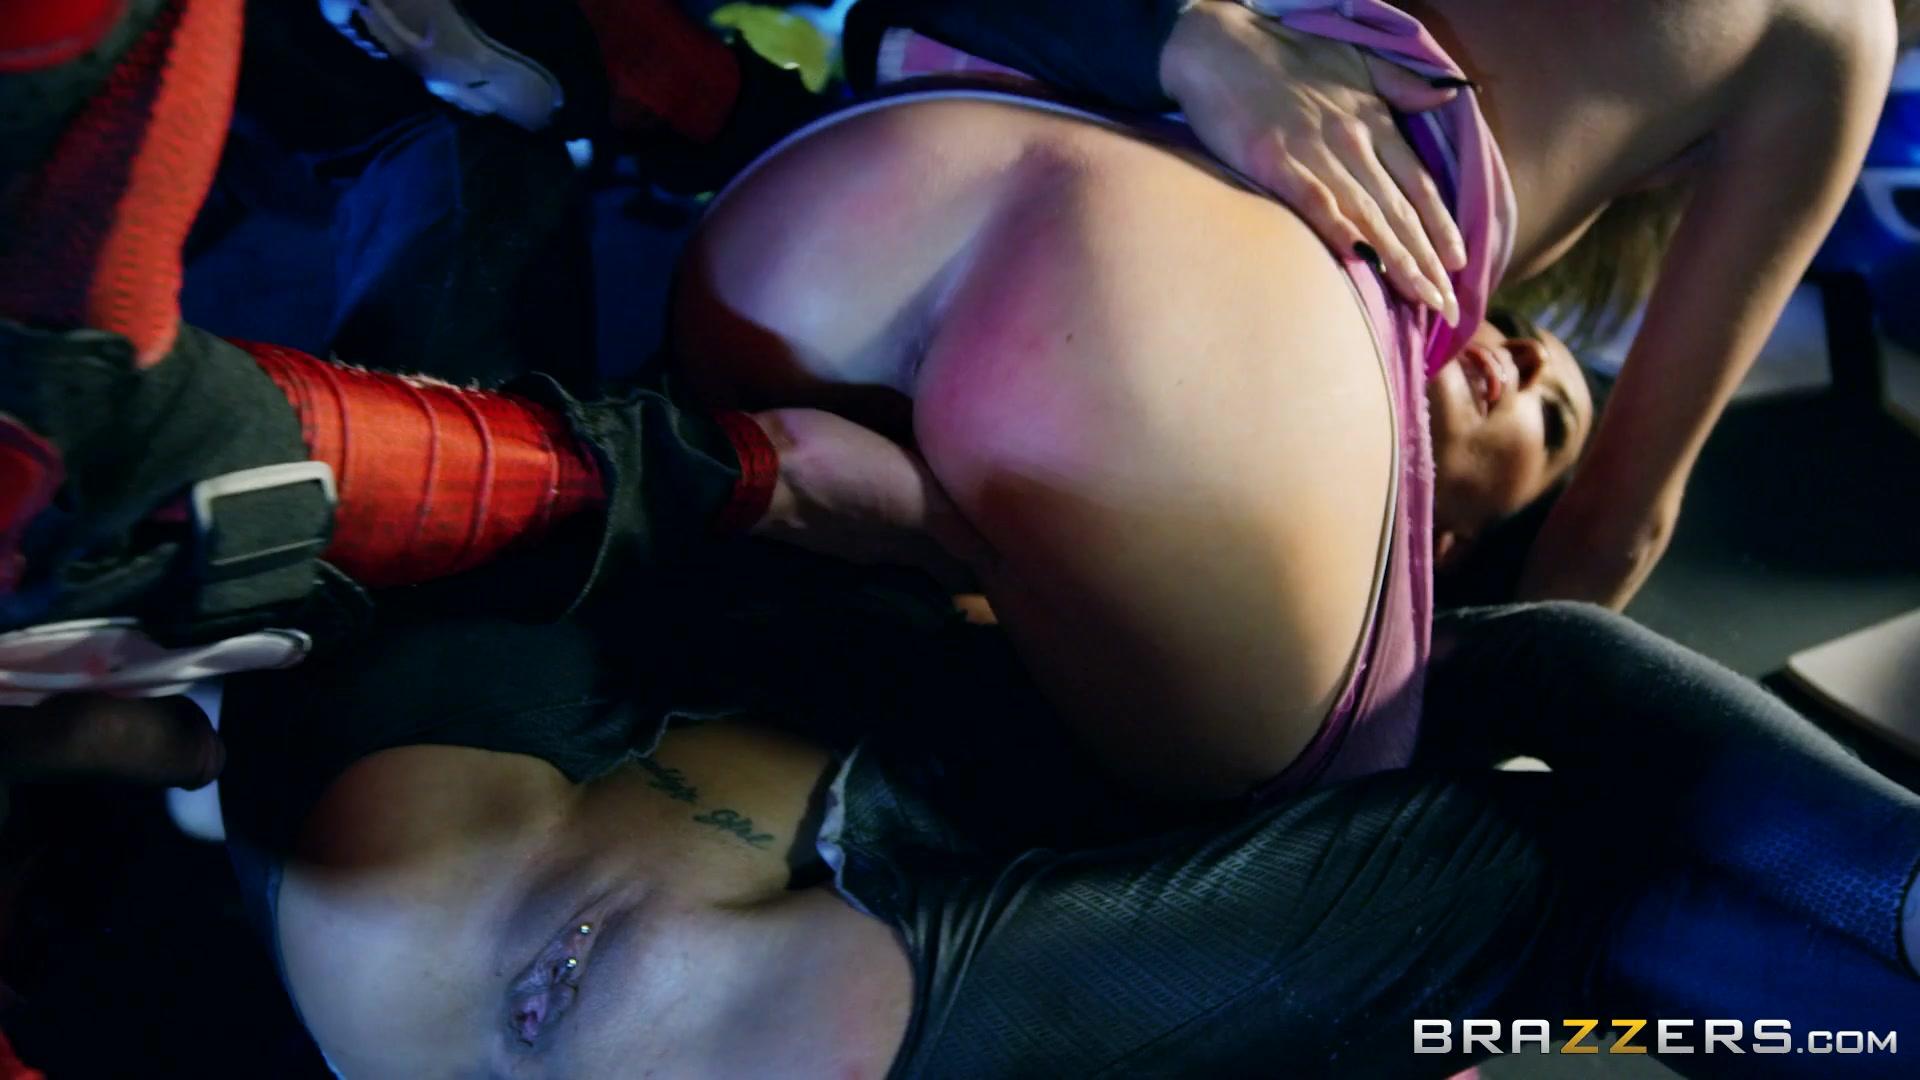 bangers porn